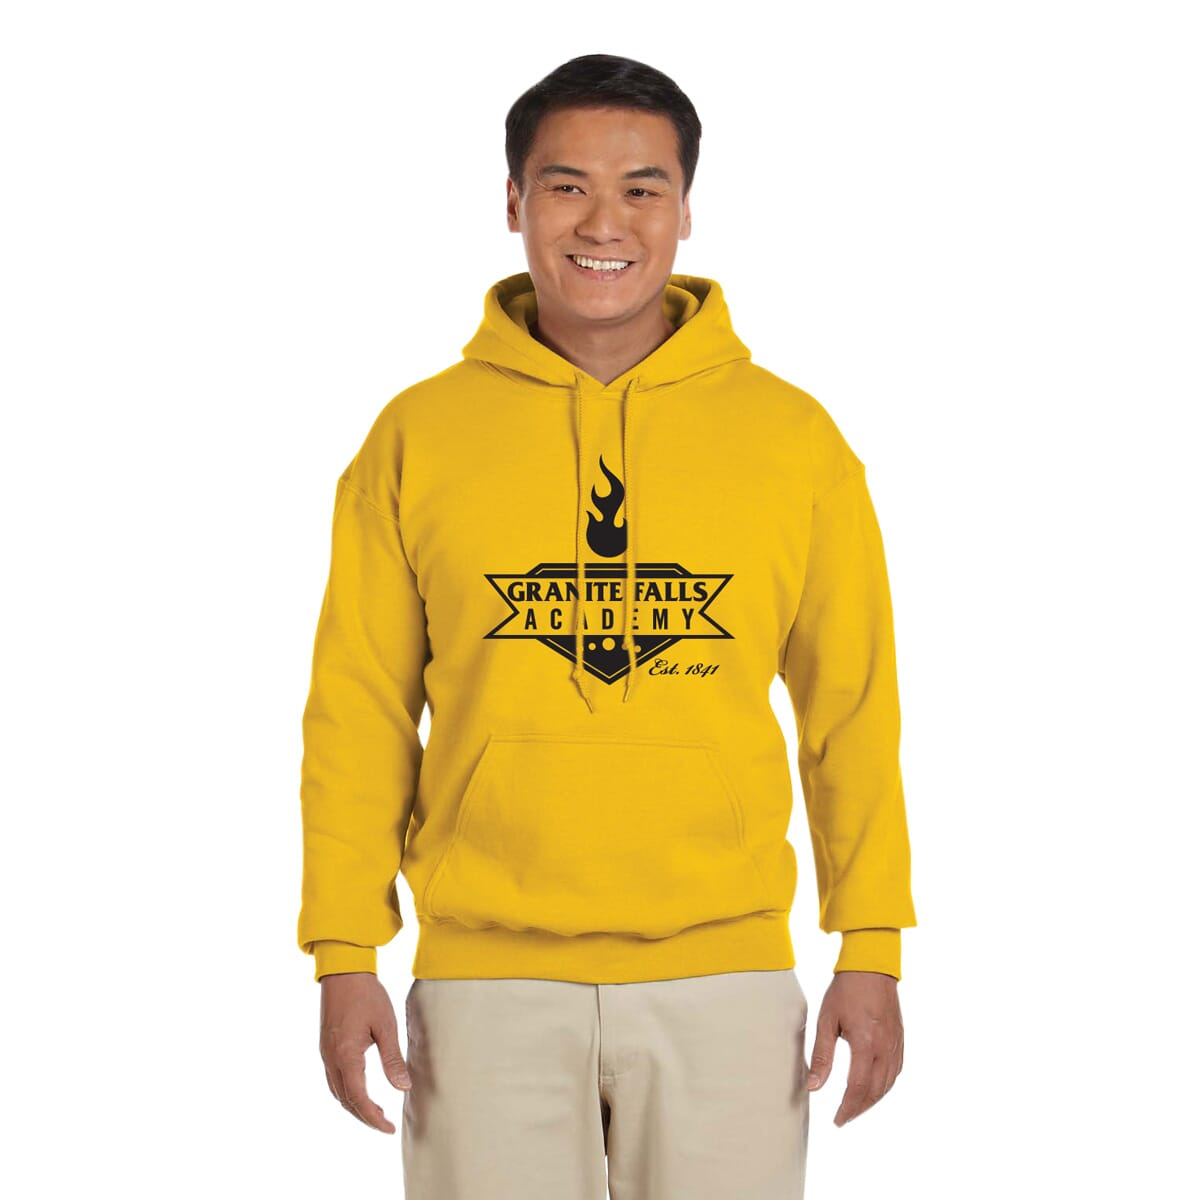 Athletic gold hoodie sweatshirt with school logo